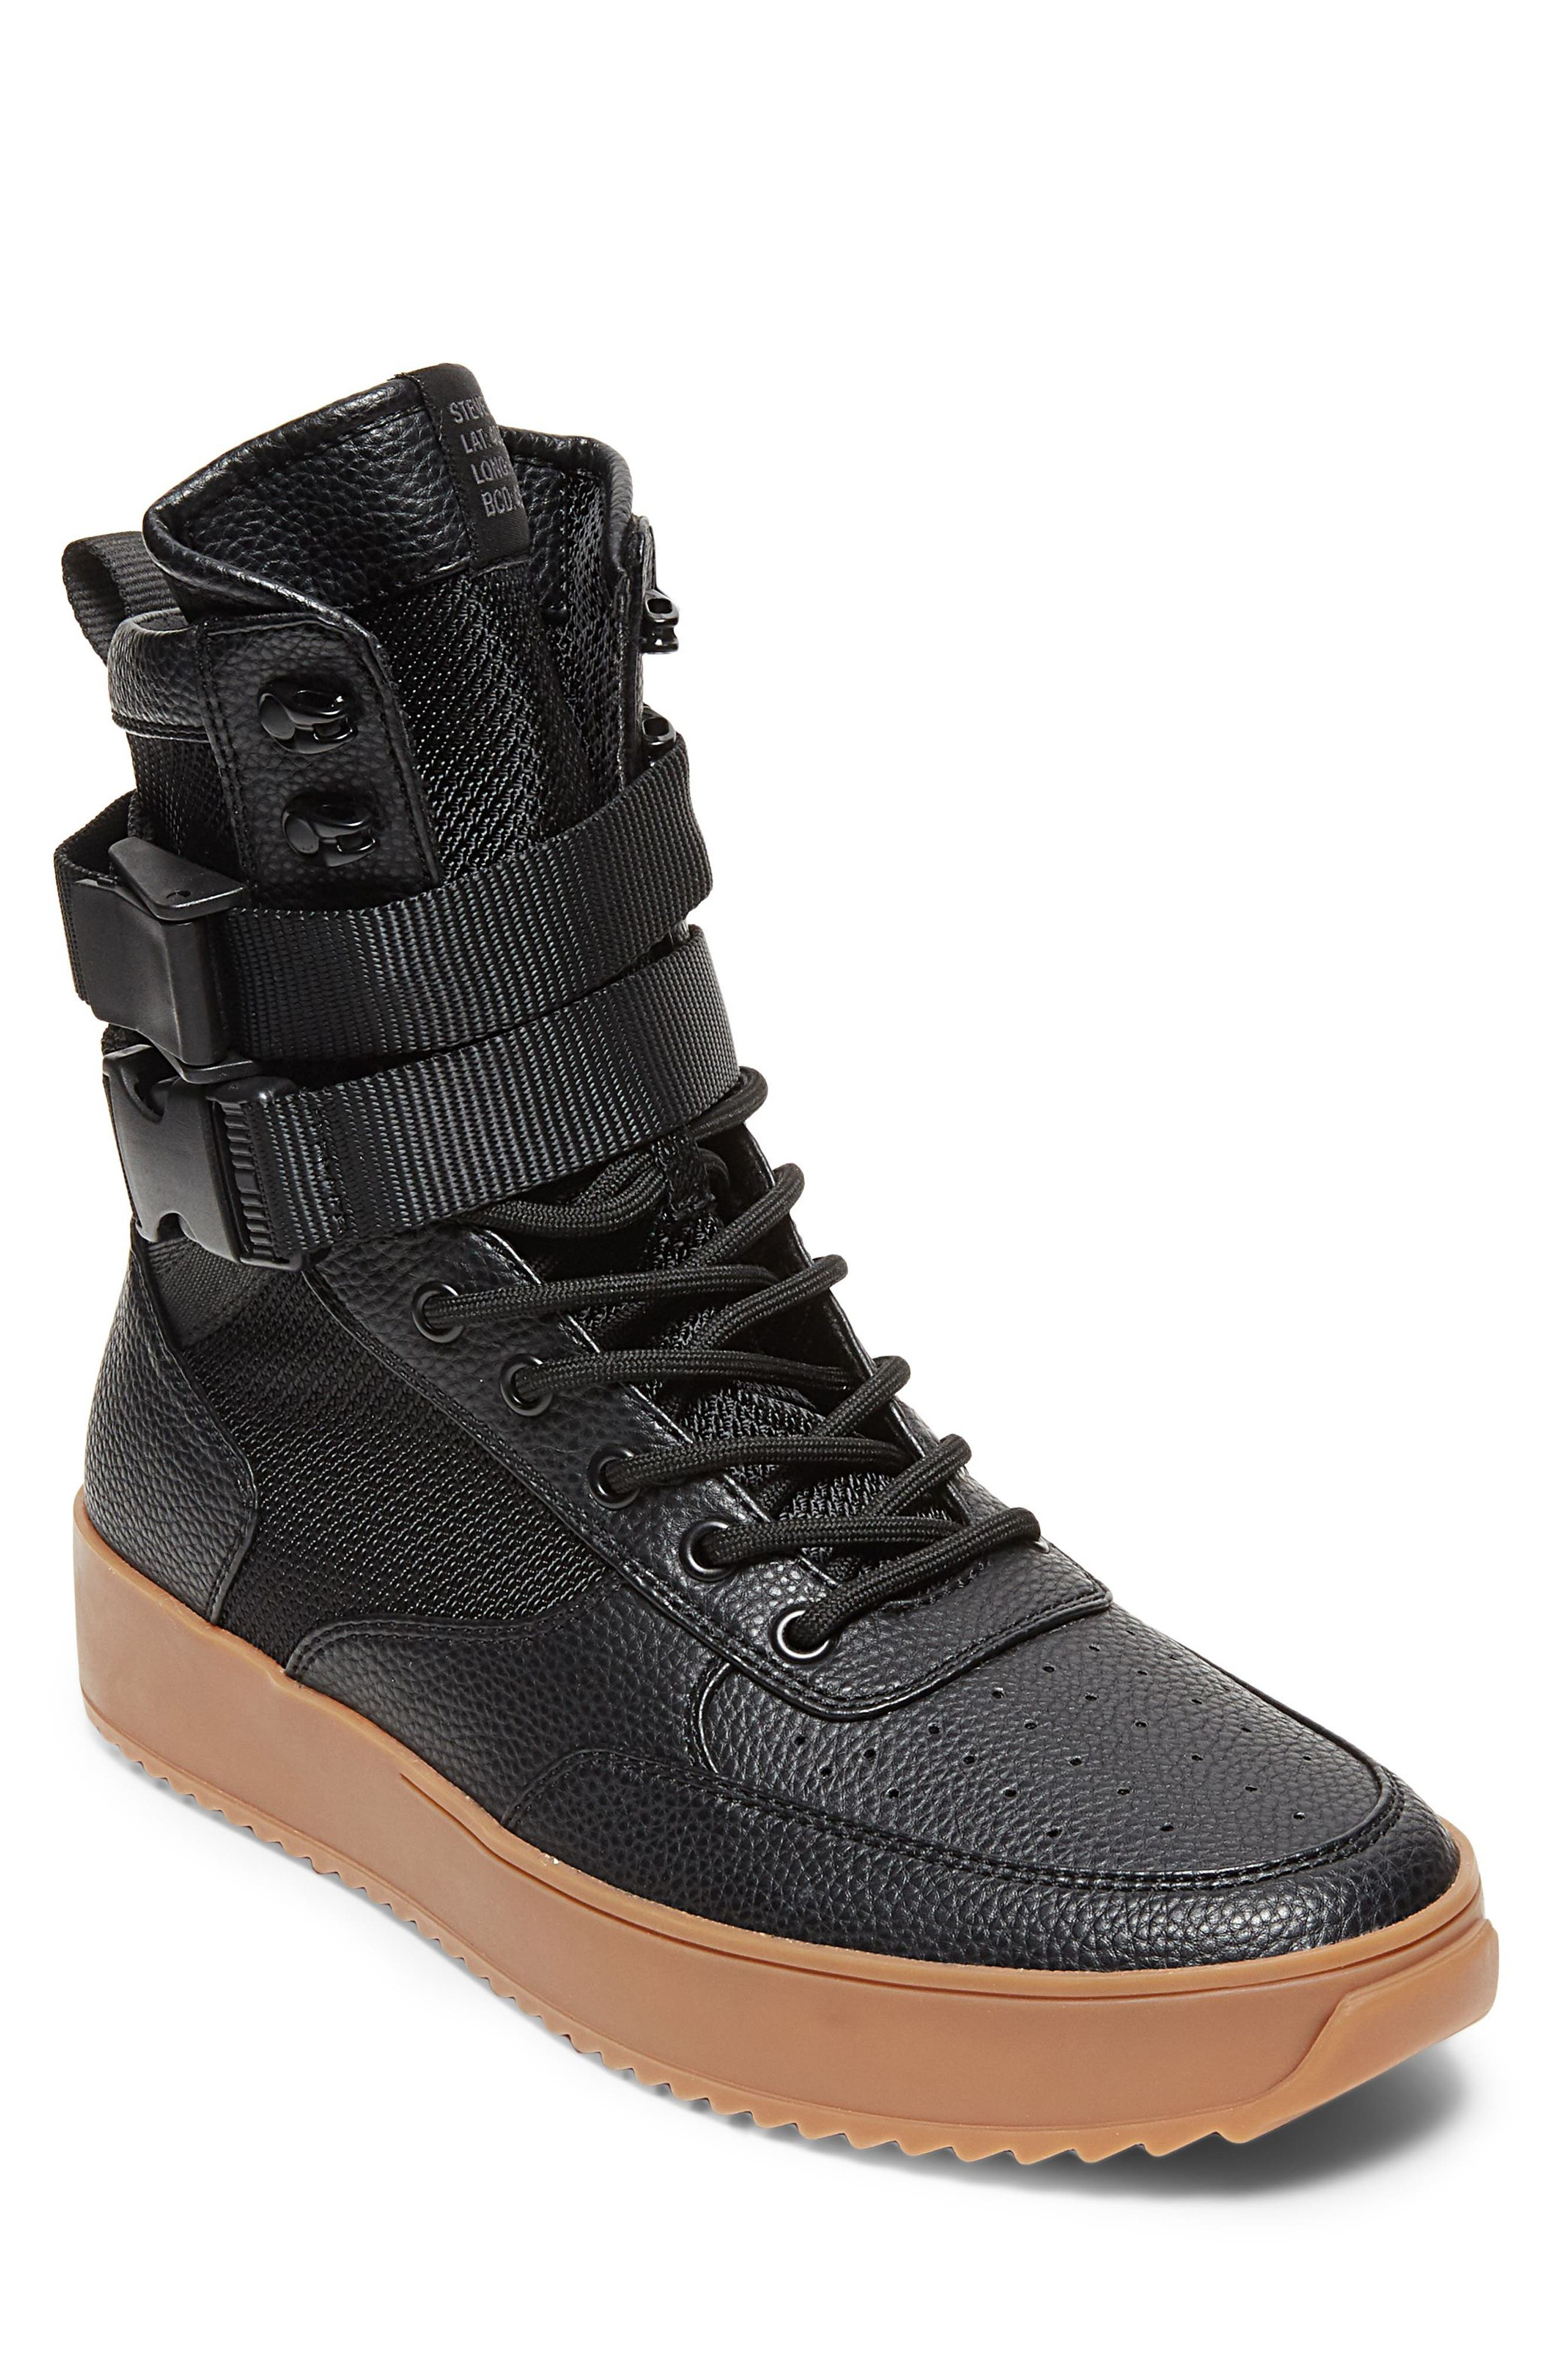 Zeroday Sneaker,                         Main,                         color,